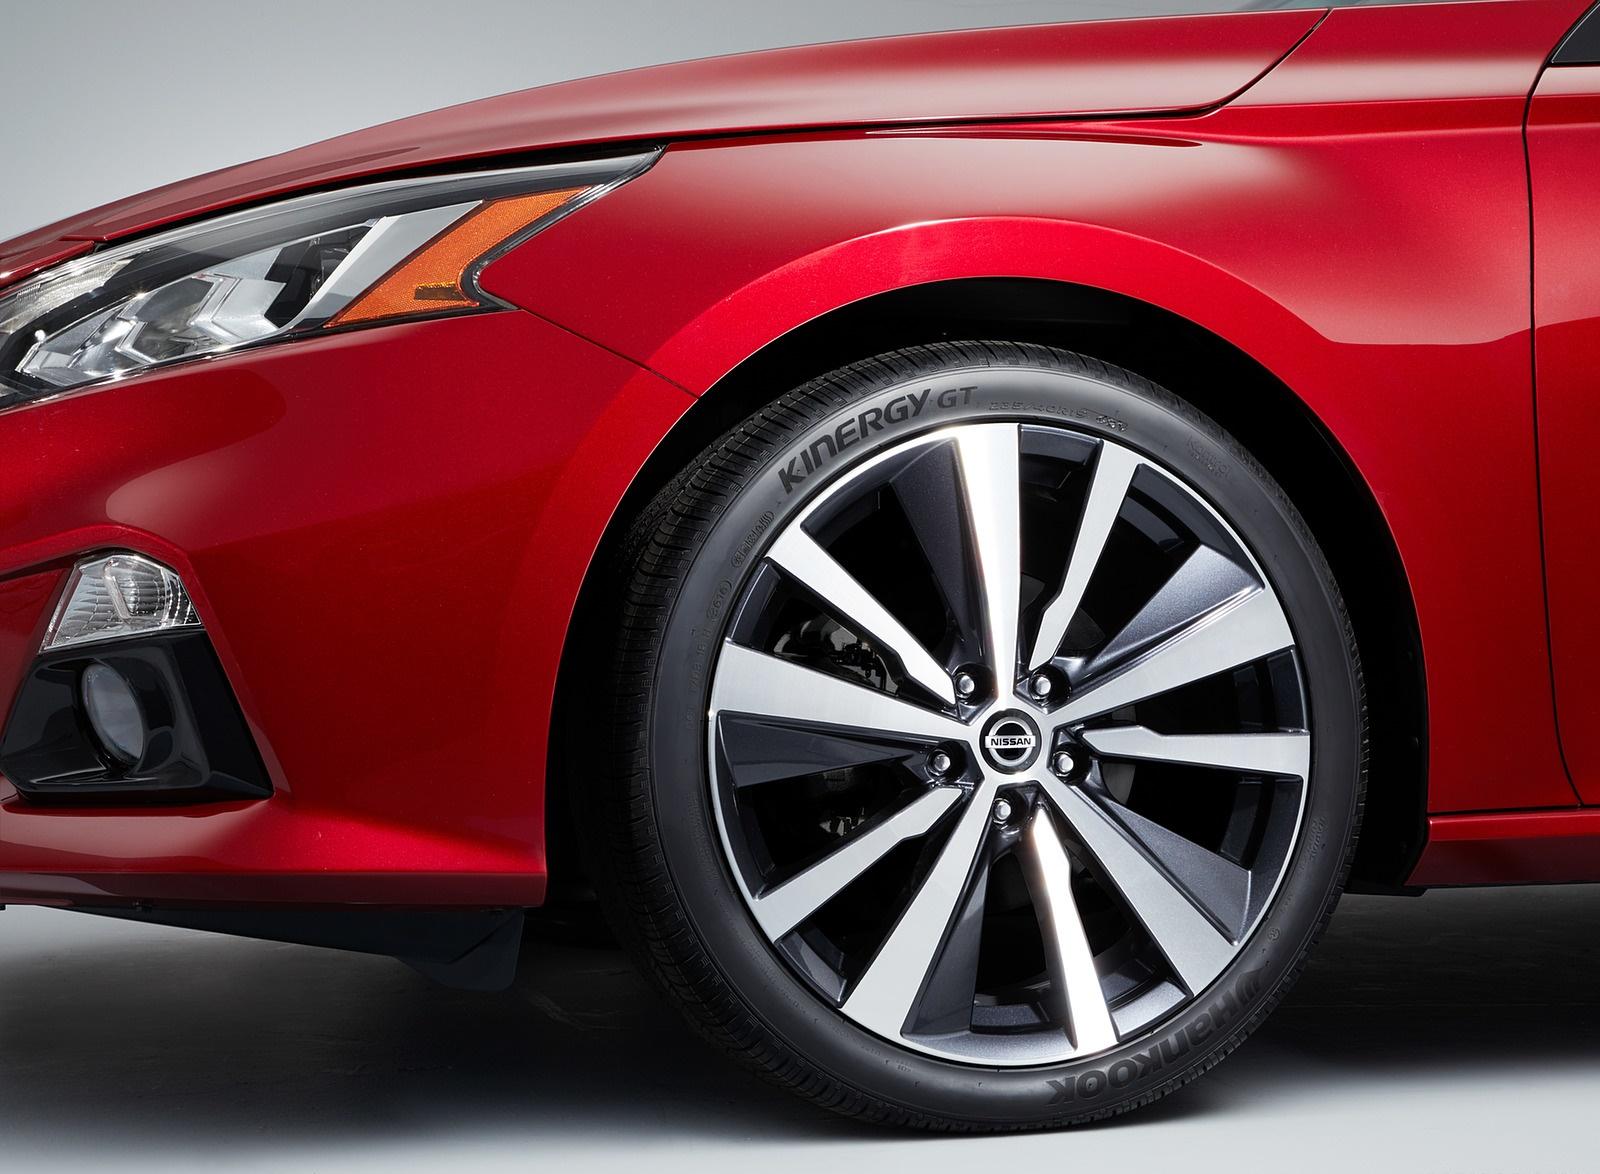 2019 Nissan Altima Wheel Wallpapers (13)